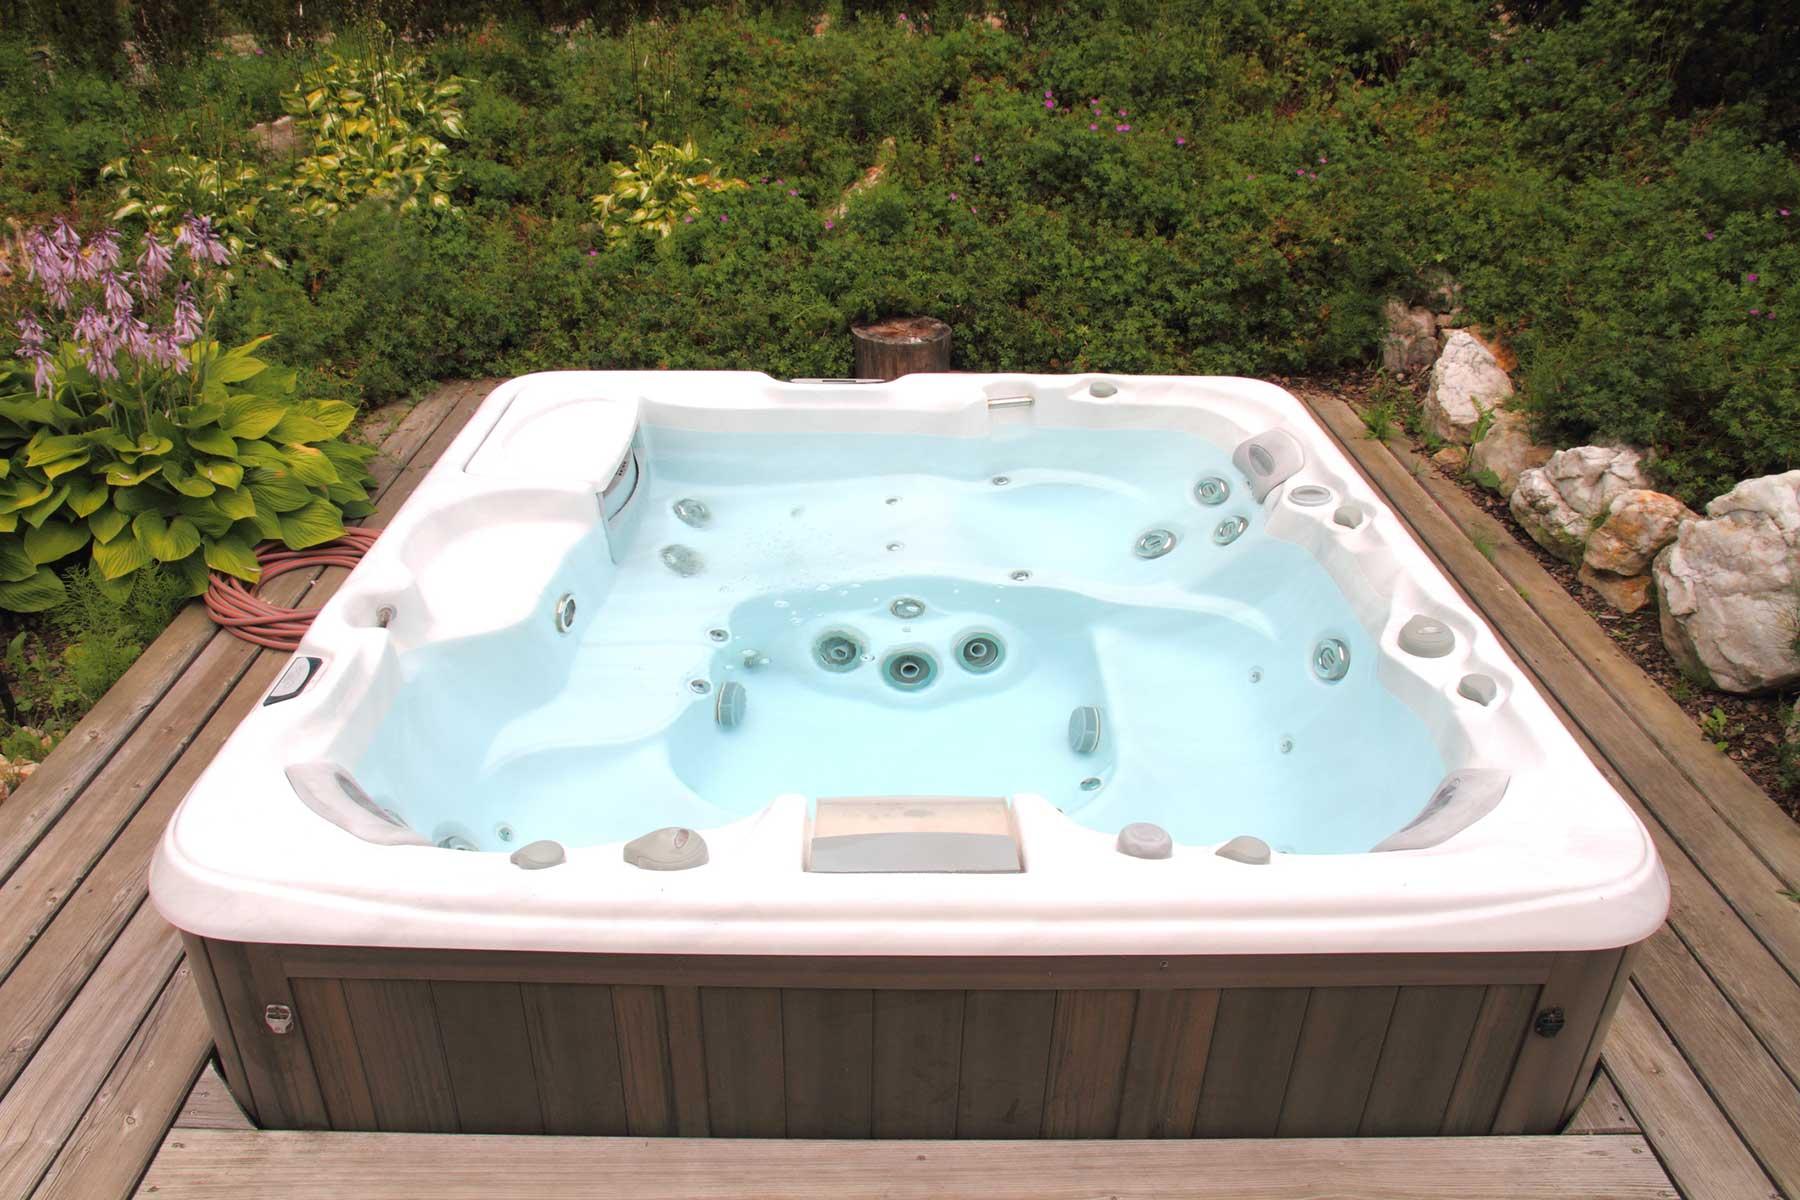 Clean Hot Tub – The Best Hot Tub Service in Western Washington